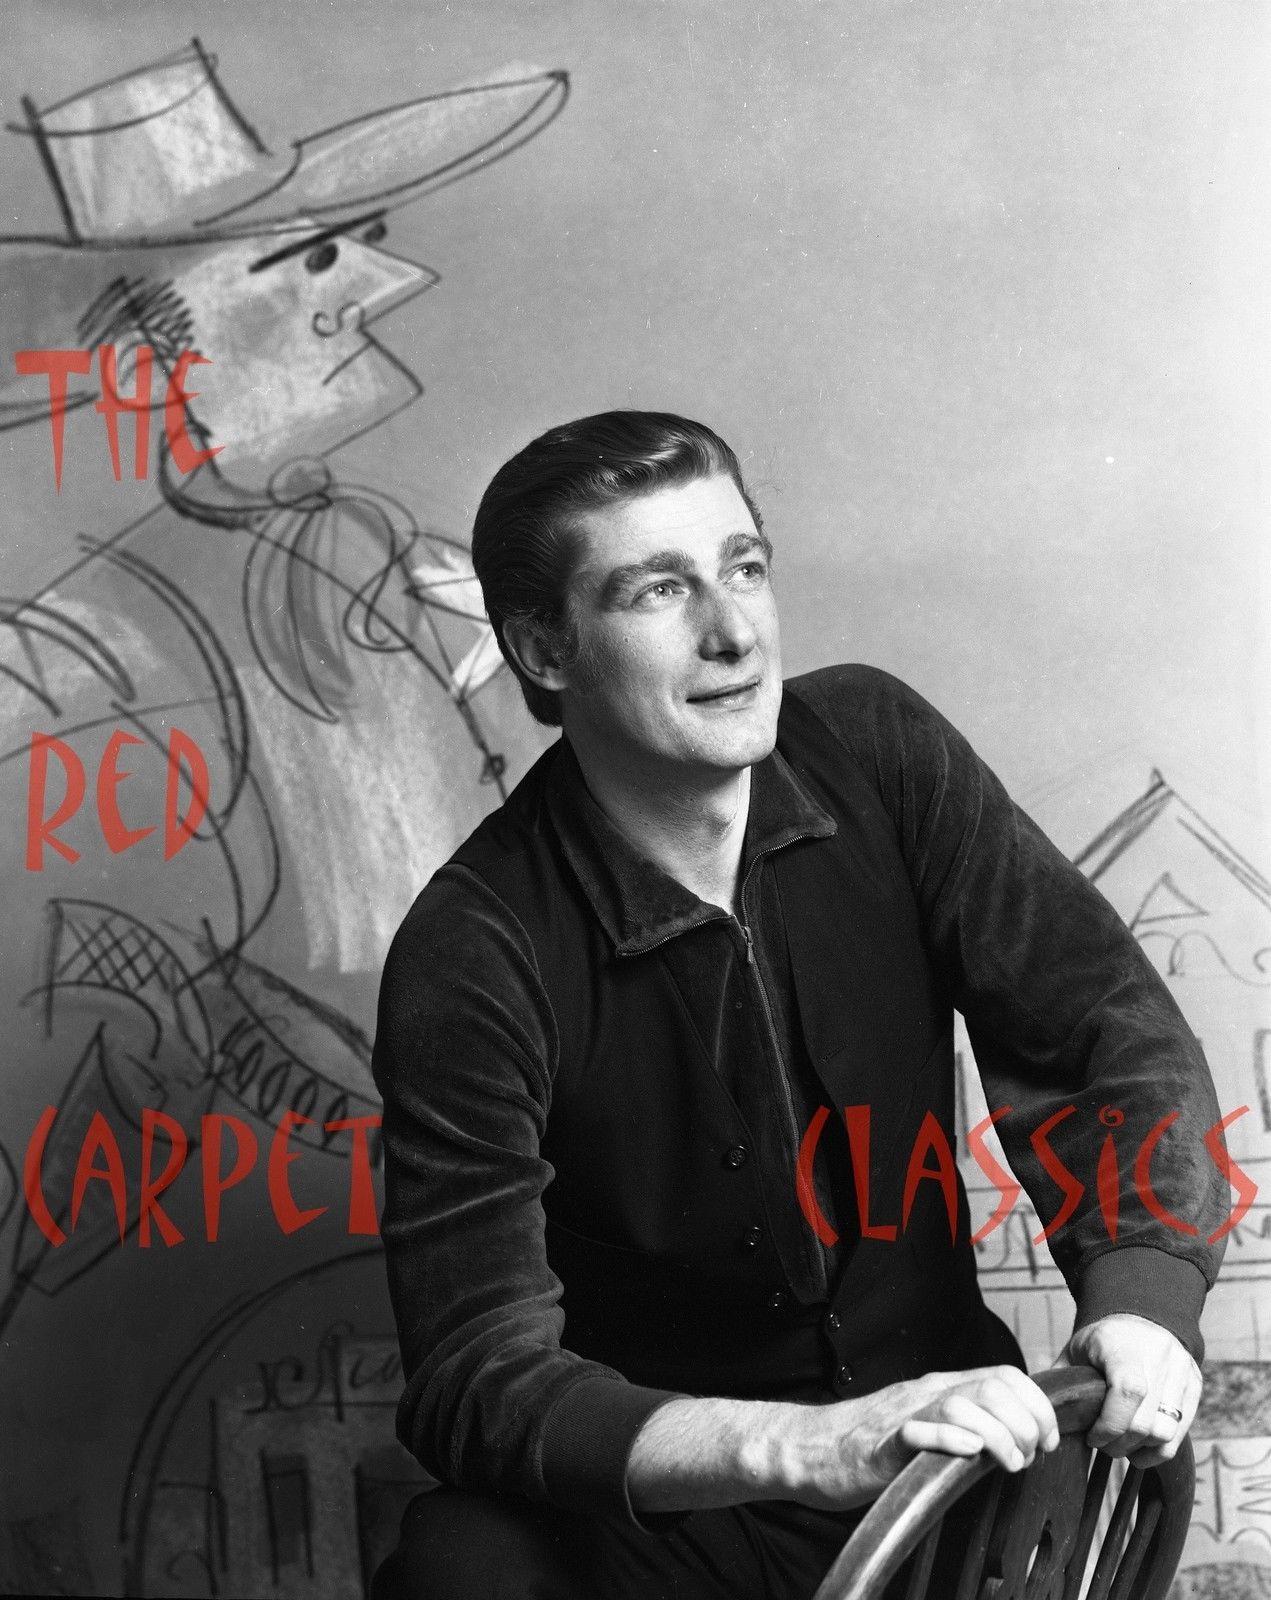 Classic_1966_Richard_Mulligan_THE_HERO_-_4x5_Film_Negative